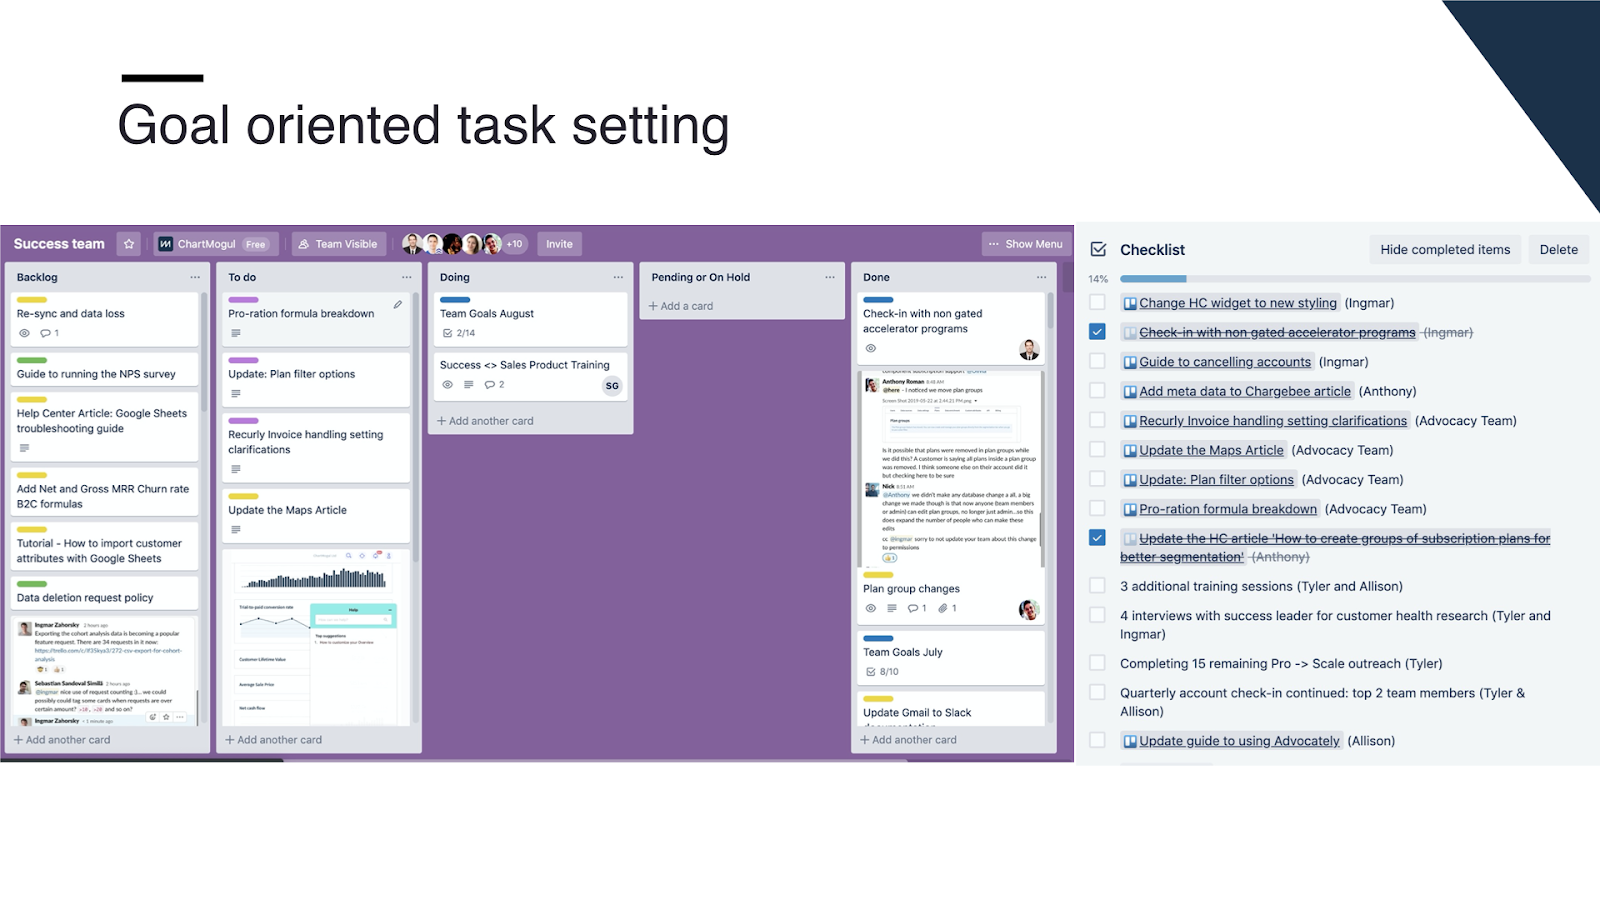 Goal-oriented task setting